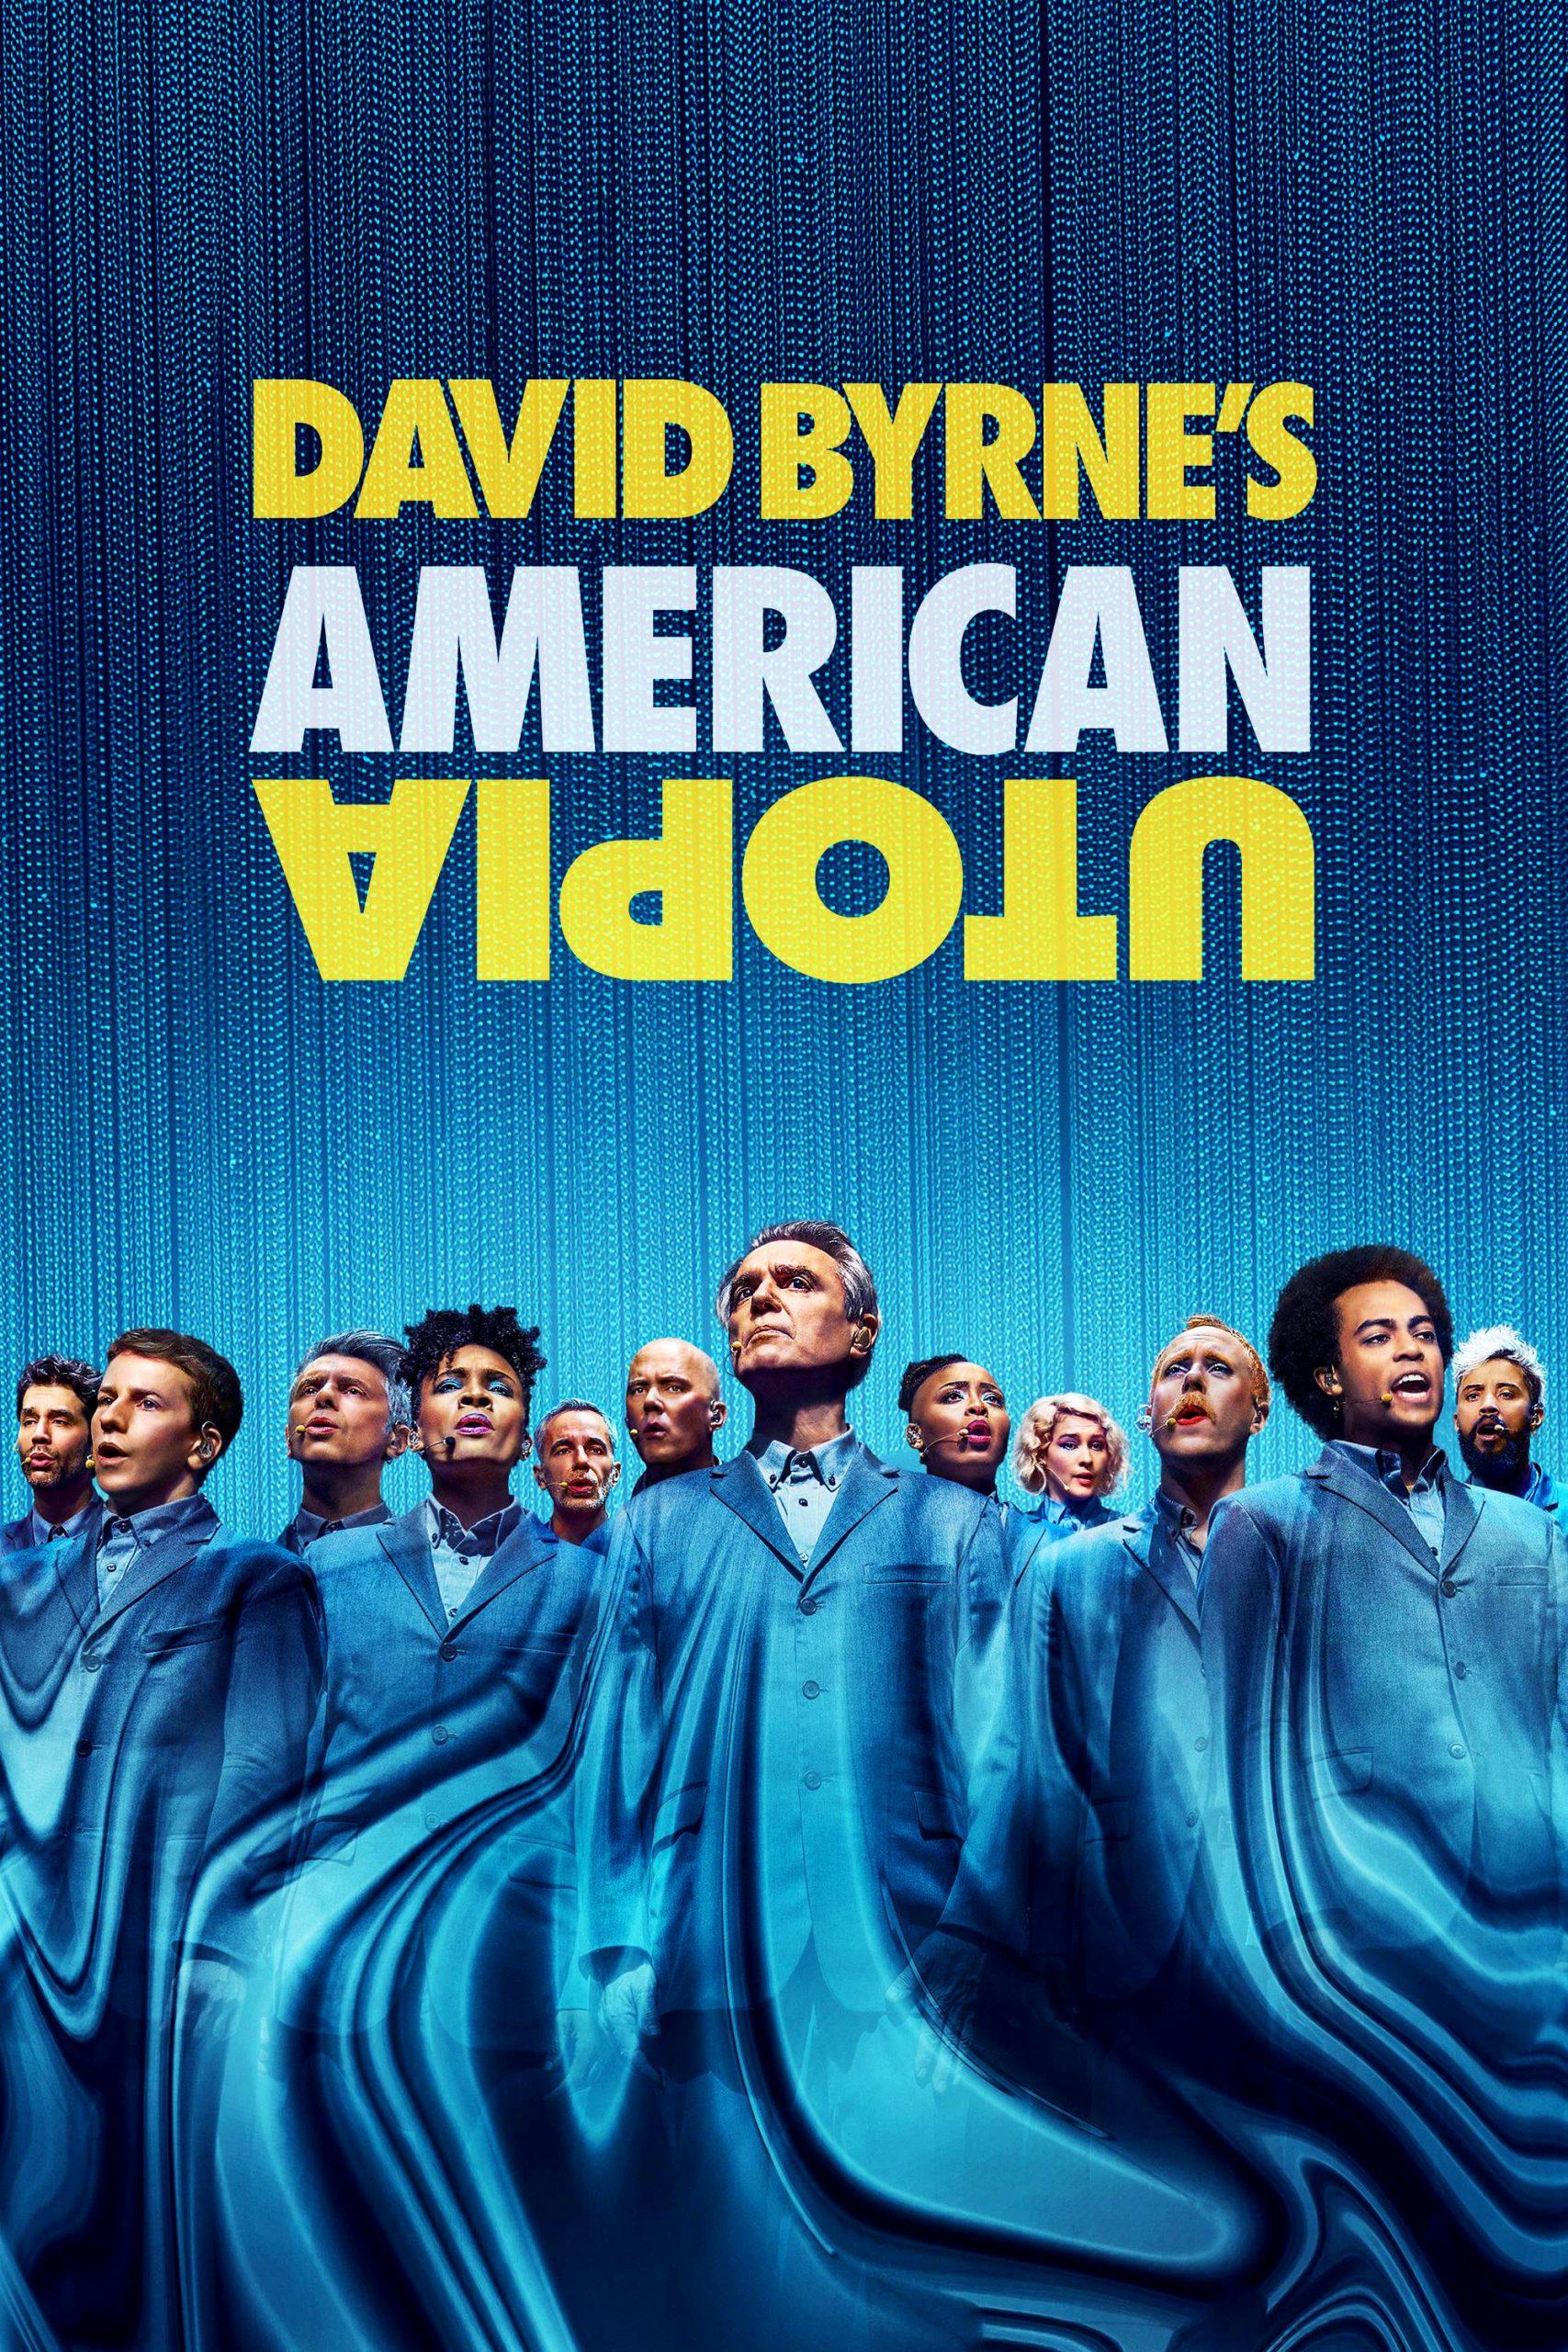 Poster for David Byrne's American Utopia (2020)